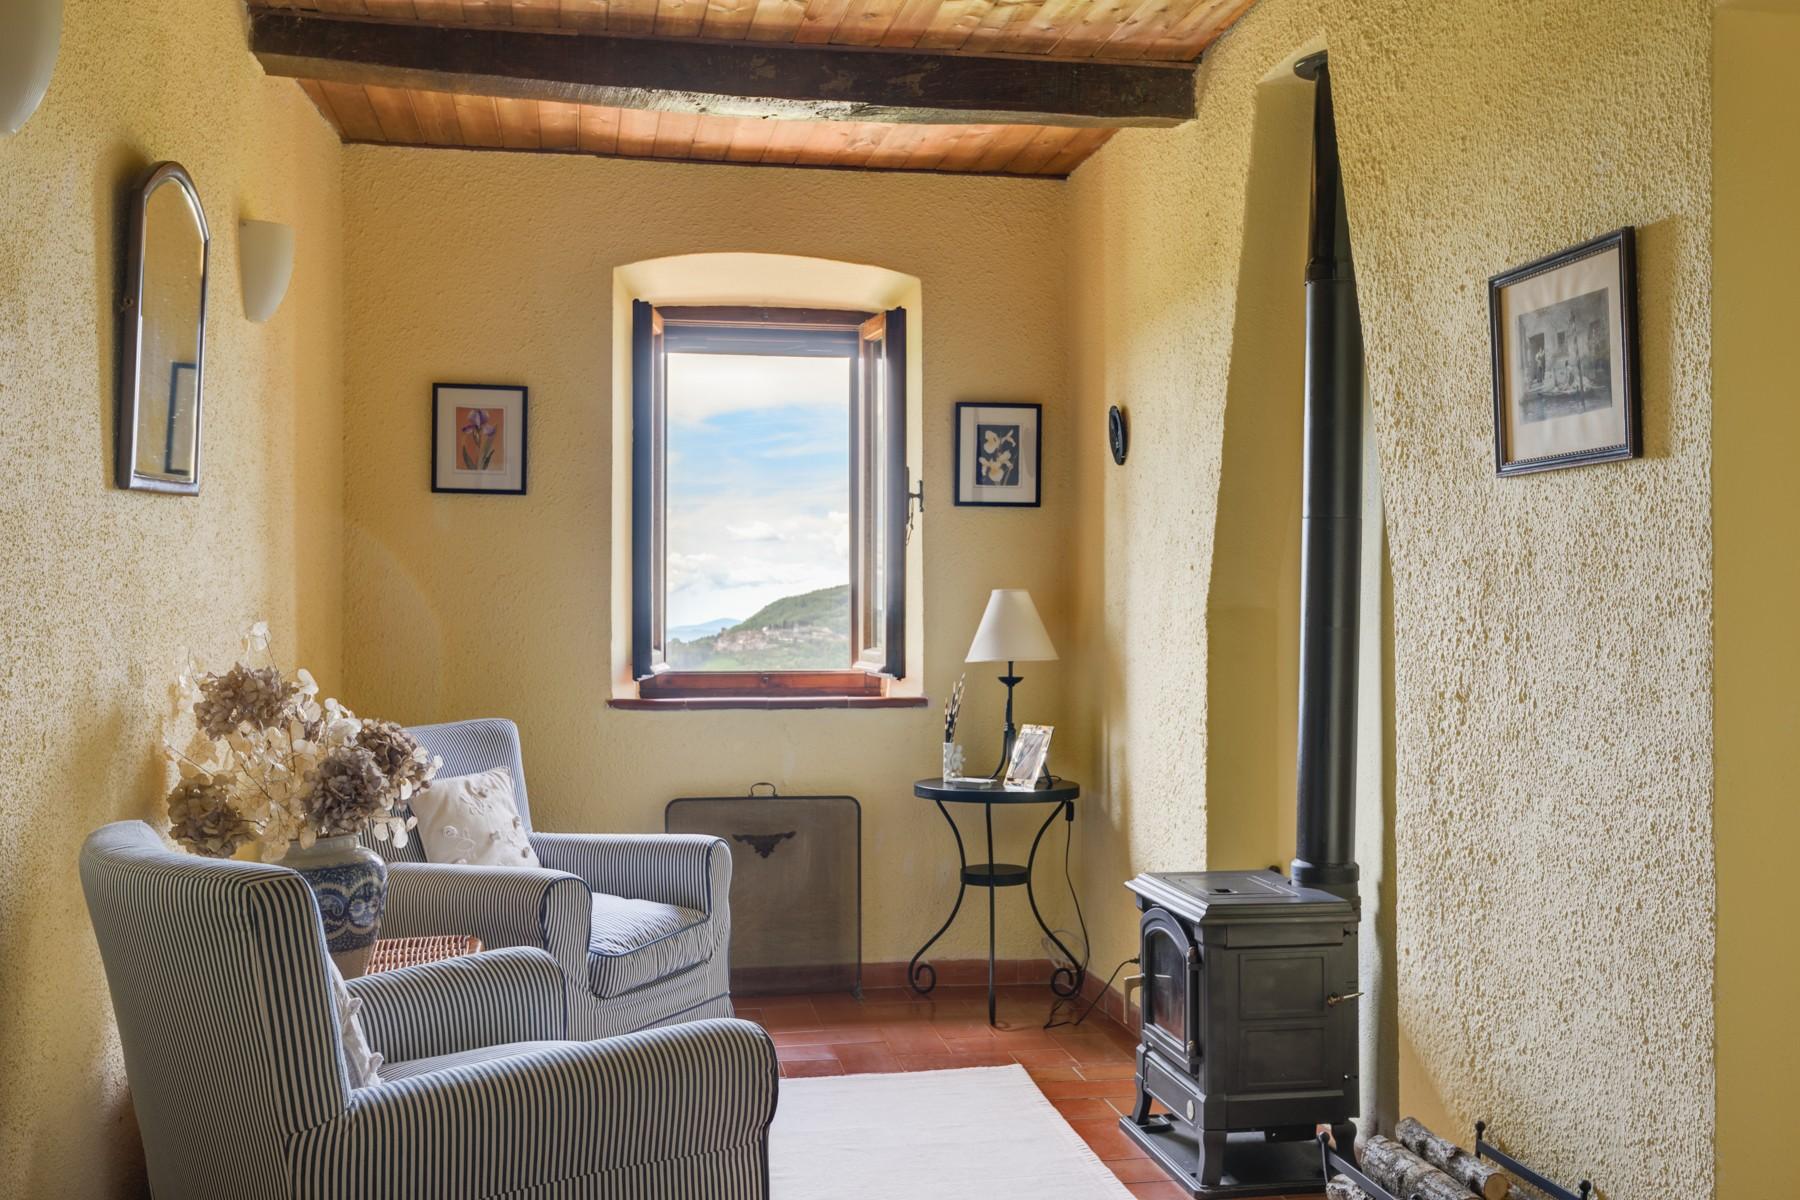 Casa indipendente in Vendita a Semproniano: 4 locali, 220 mq - Foto 14